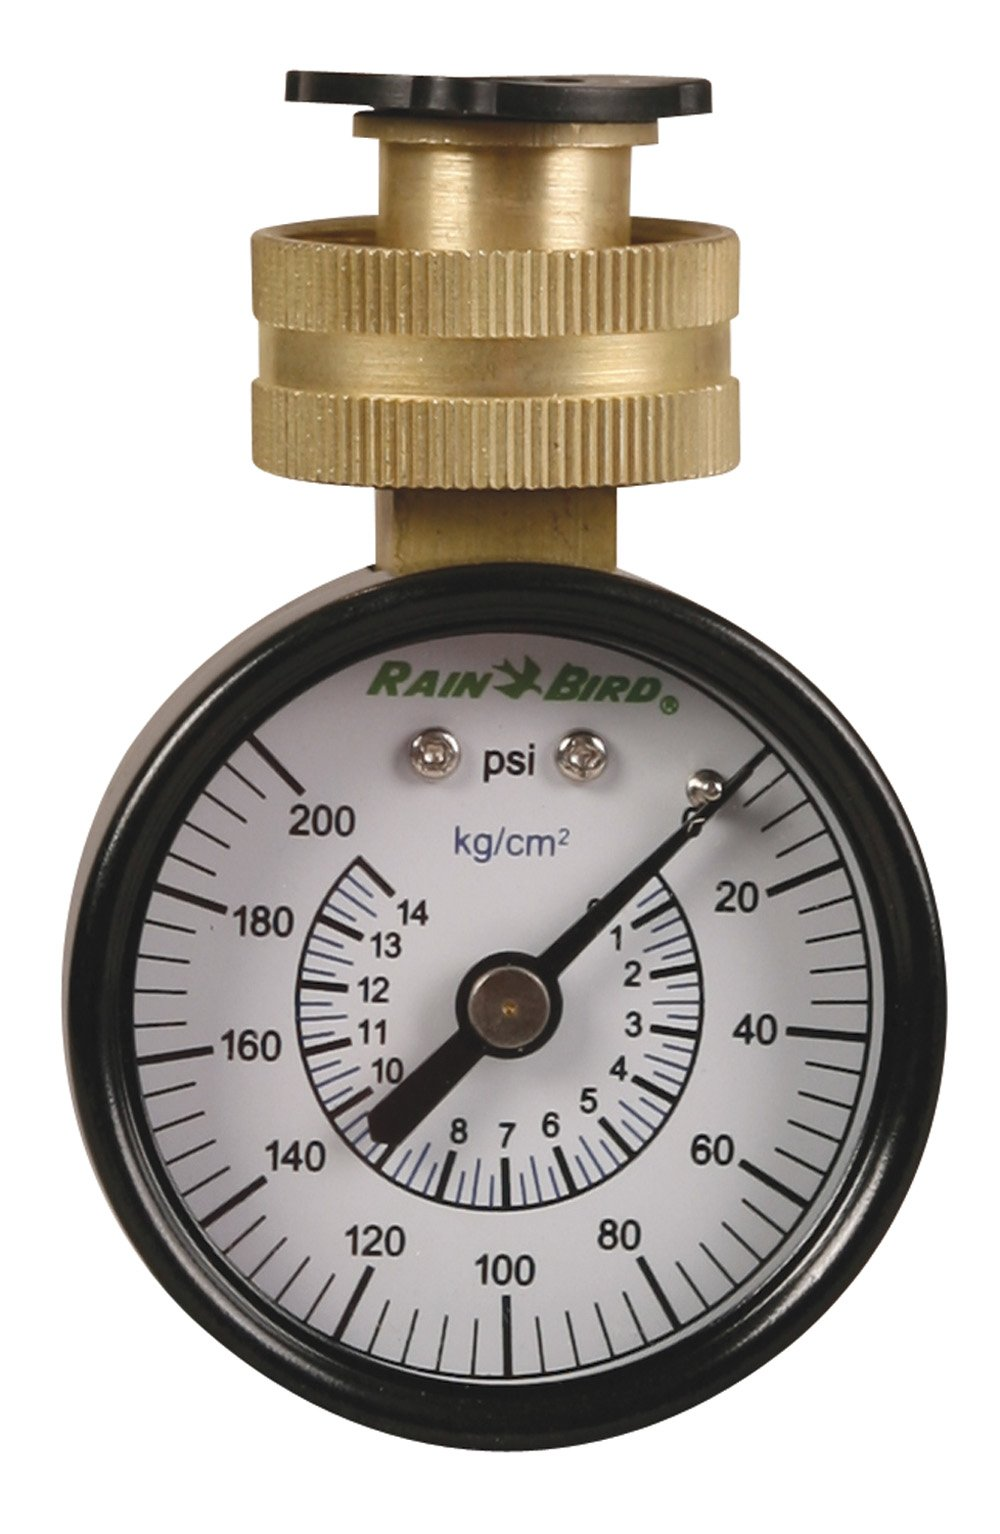 Rain Bird P2A Water Pressure Test Gauge, 3/4'' Female Hose Thread, 0-200 PSI